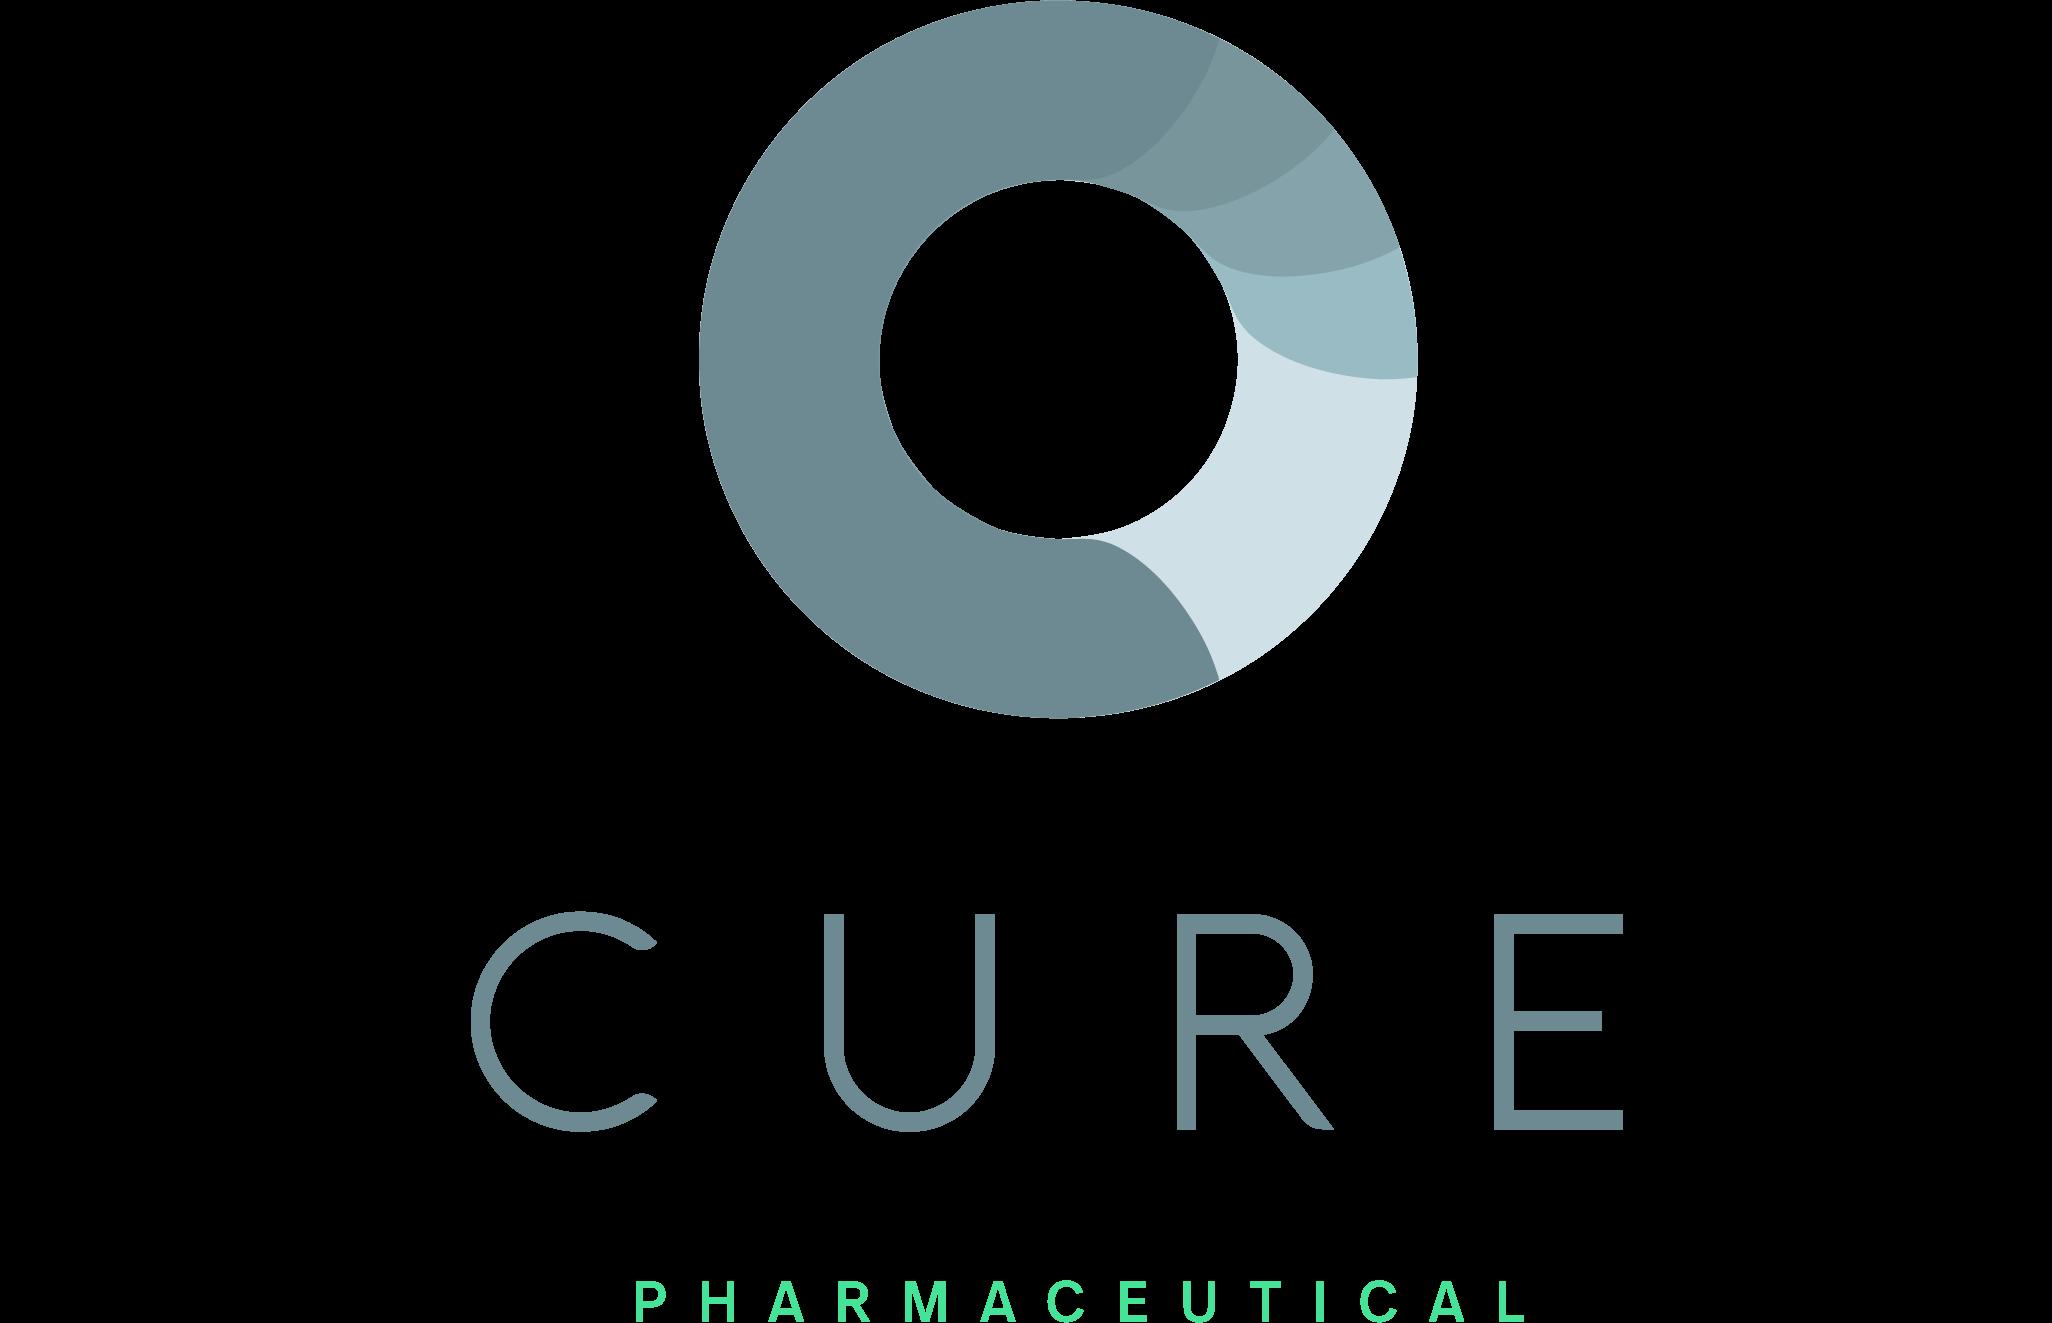 CurePharma - Euvy Tat